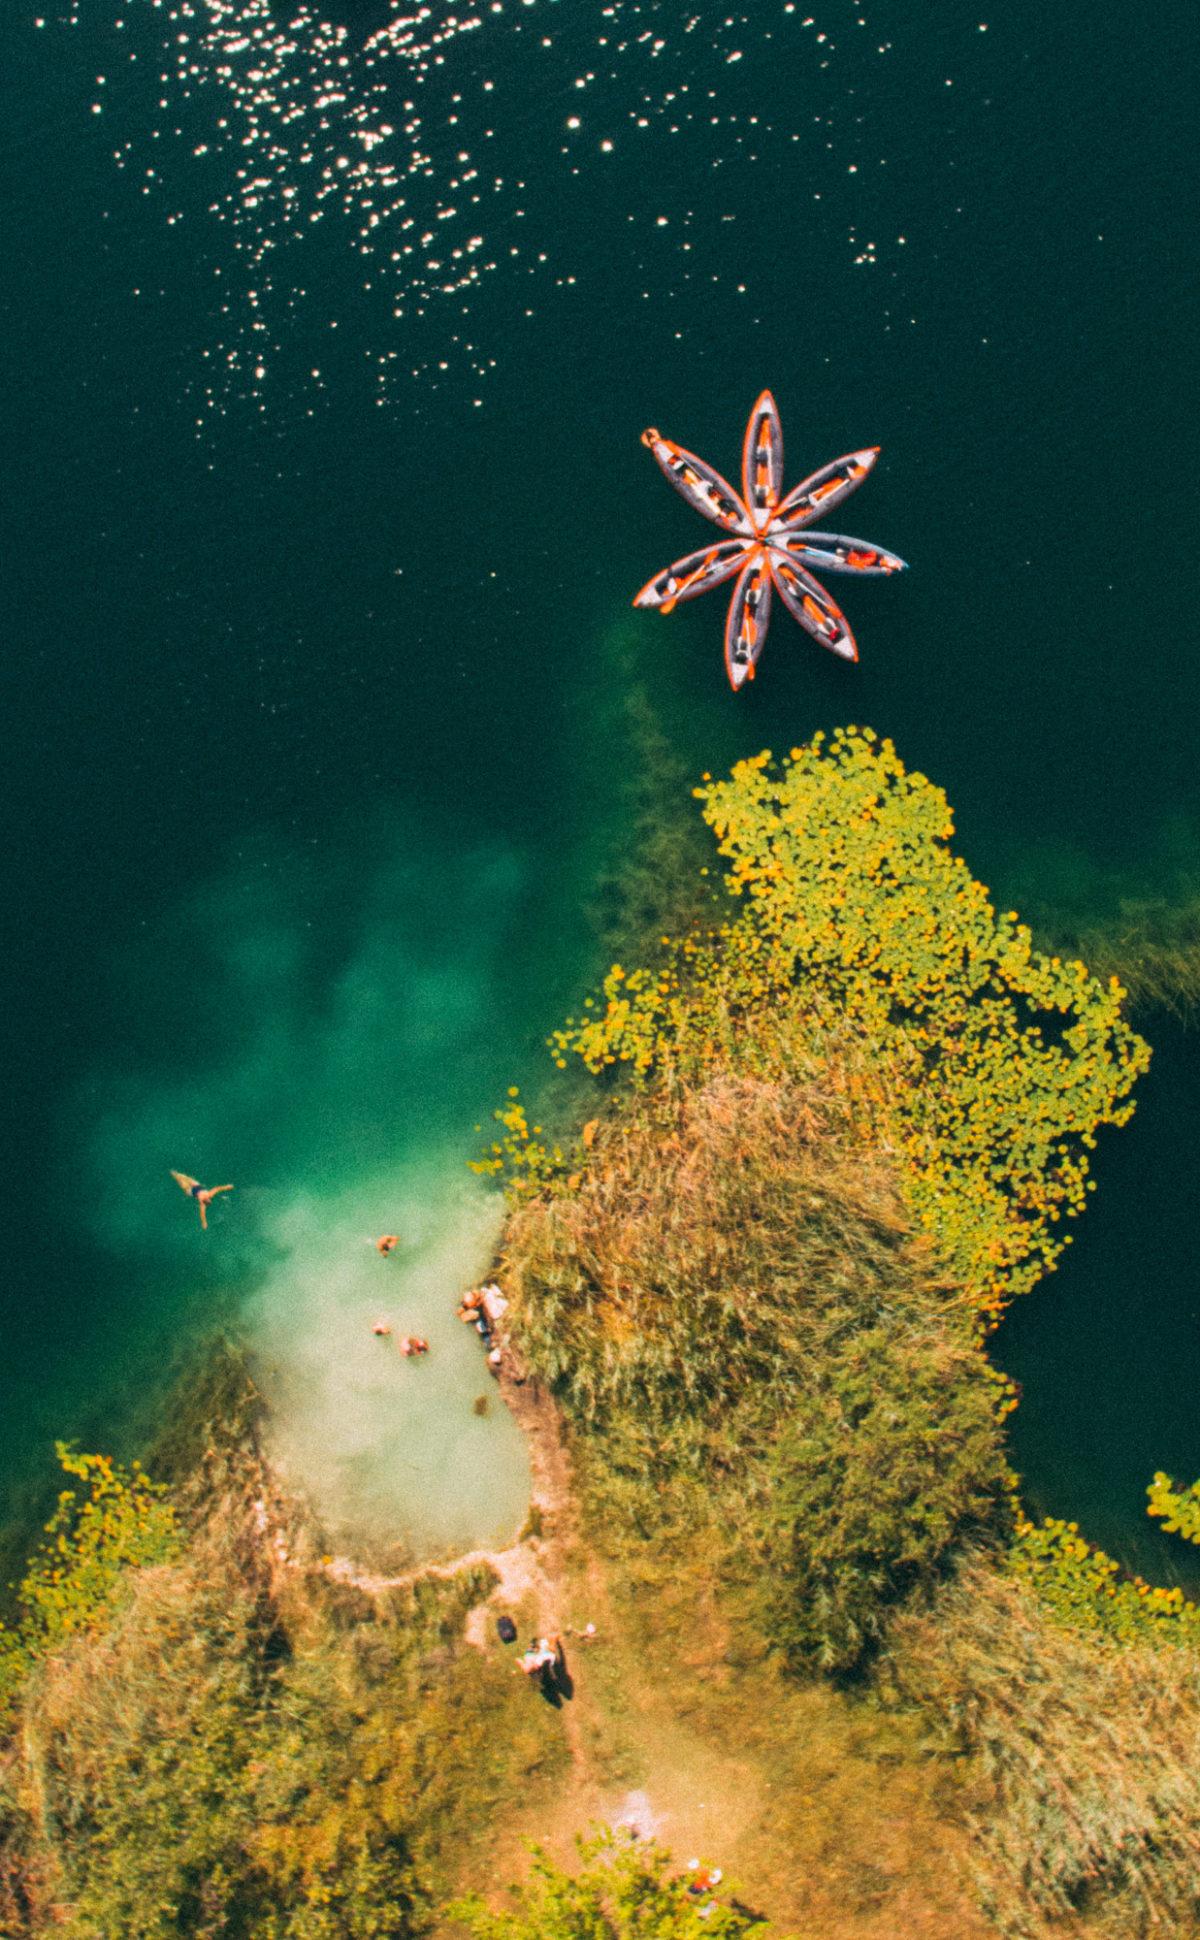 bacina-lakes-in-dalmatia